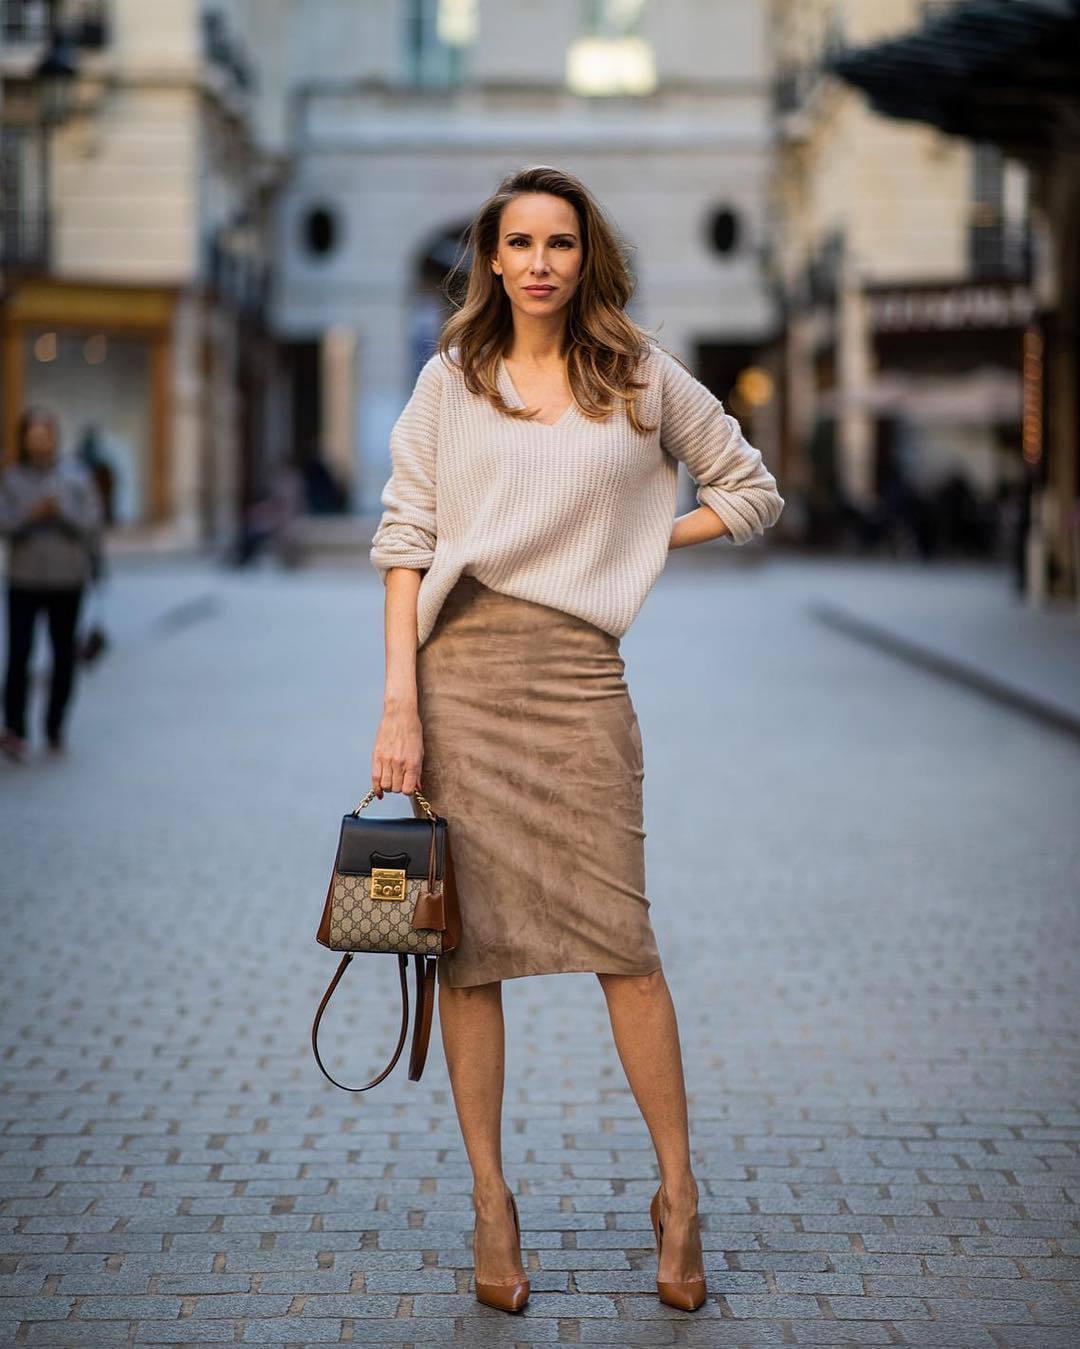 skirt high waisted skirt suede skirt pumps bag oversized sweater v neck